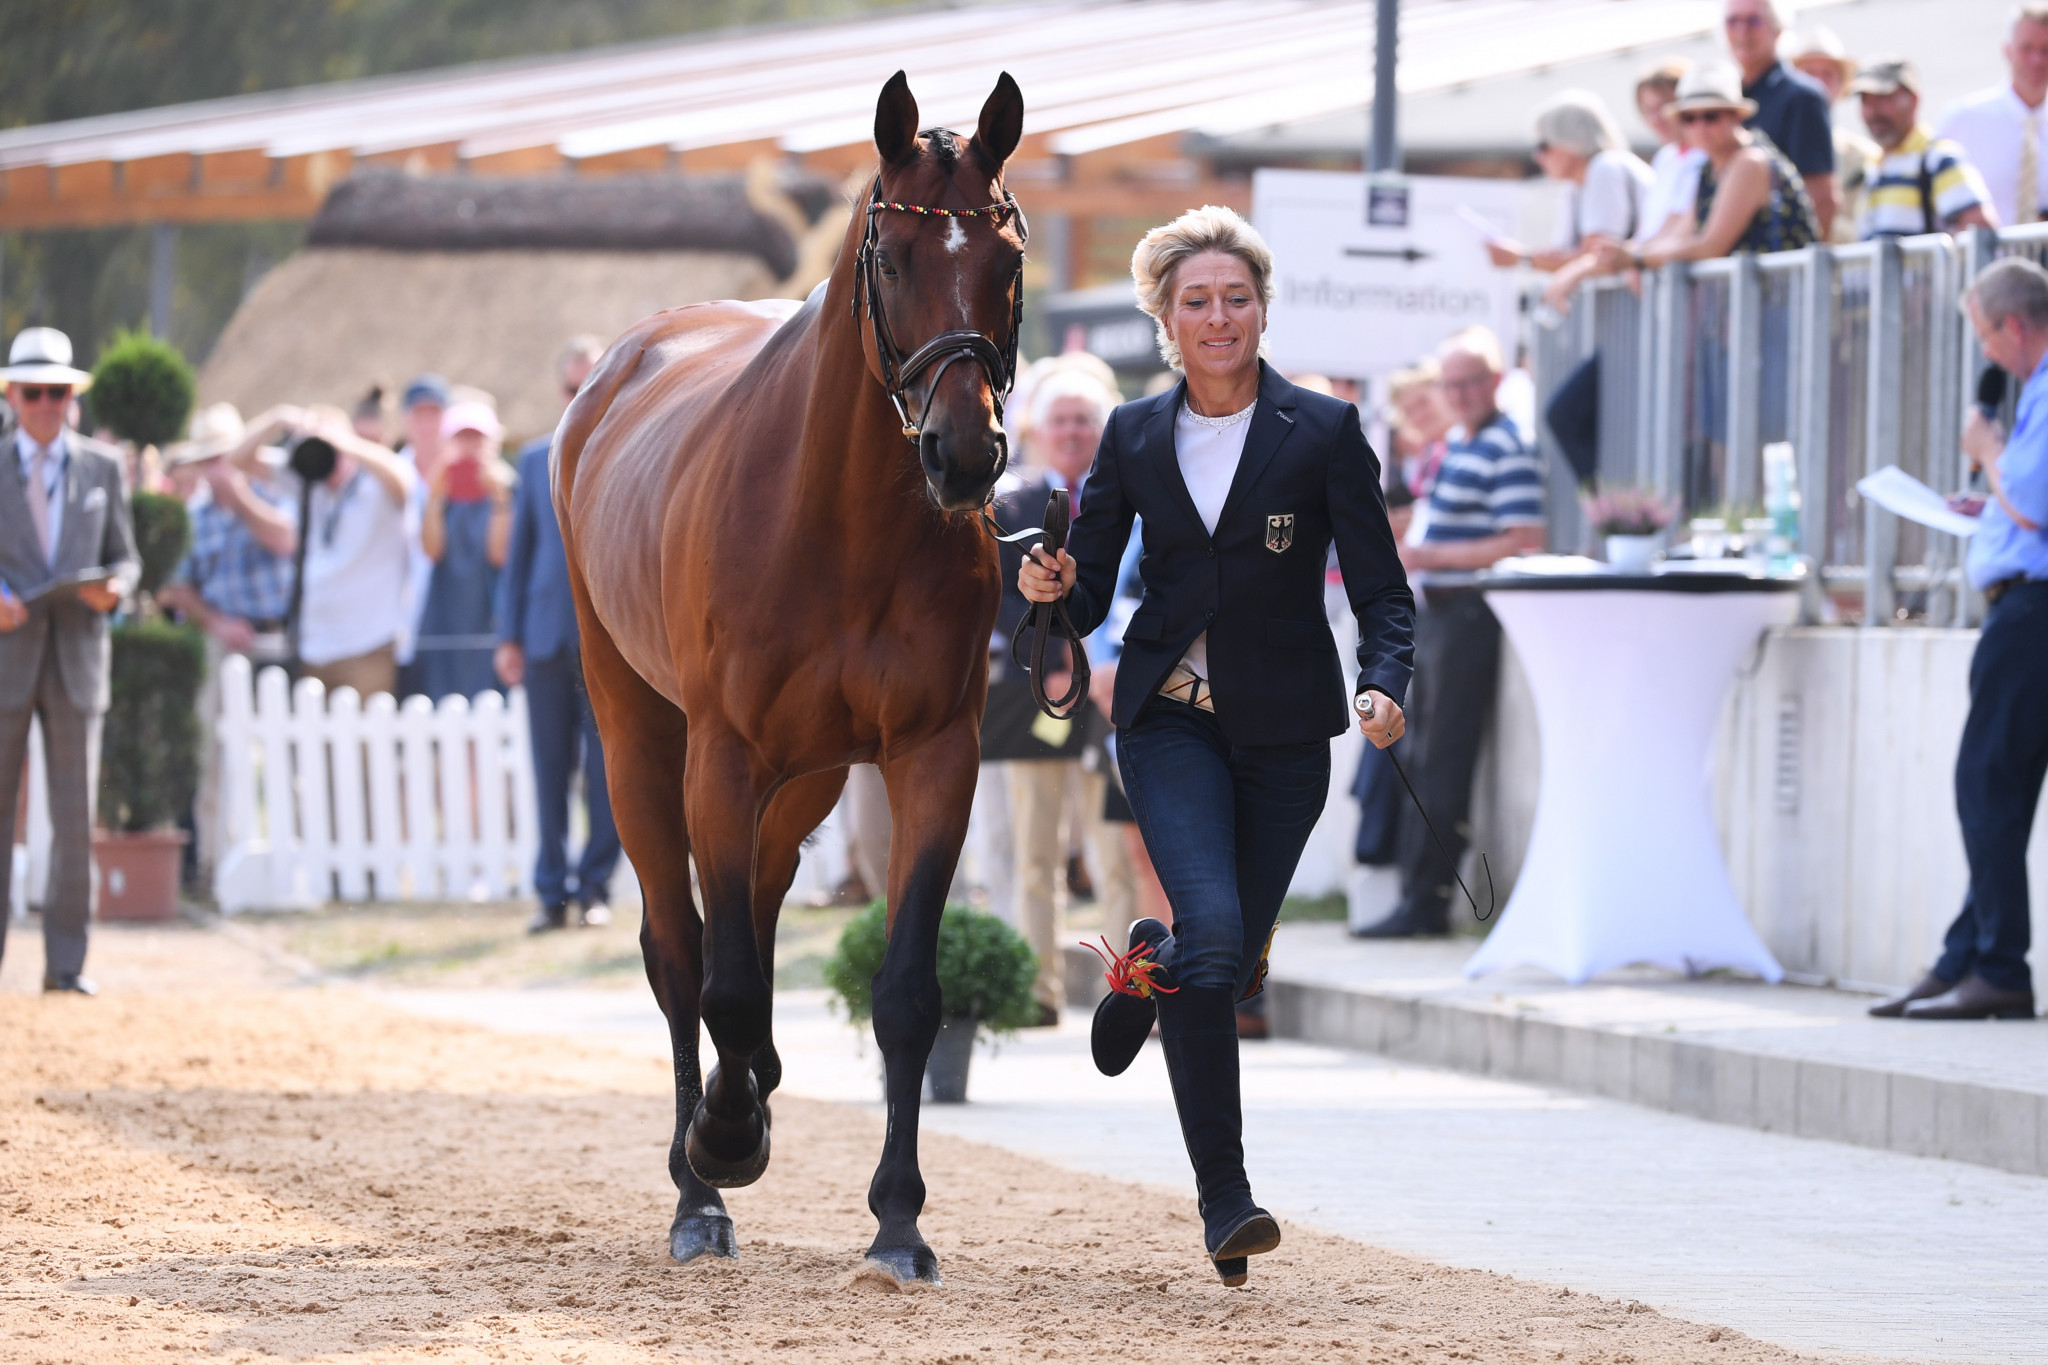 German eventer Ingrid Klimke won the best athlete award last year ©Getty Images